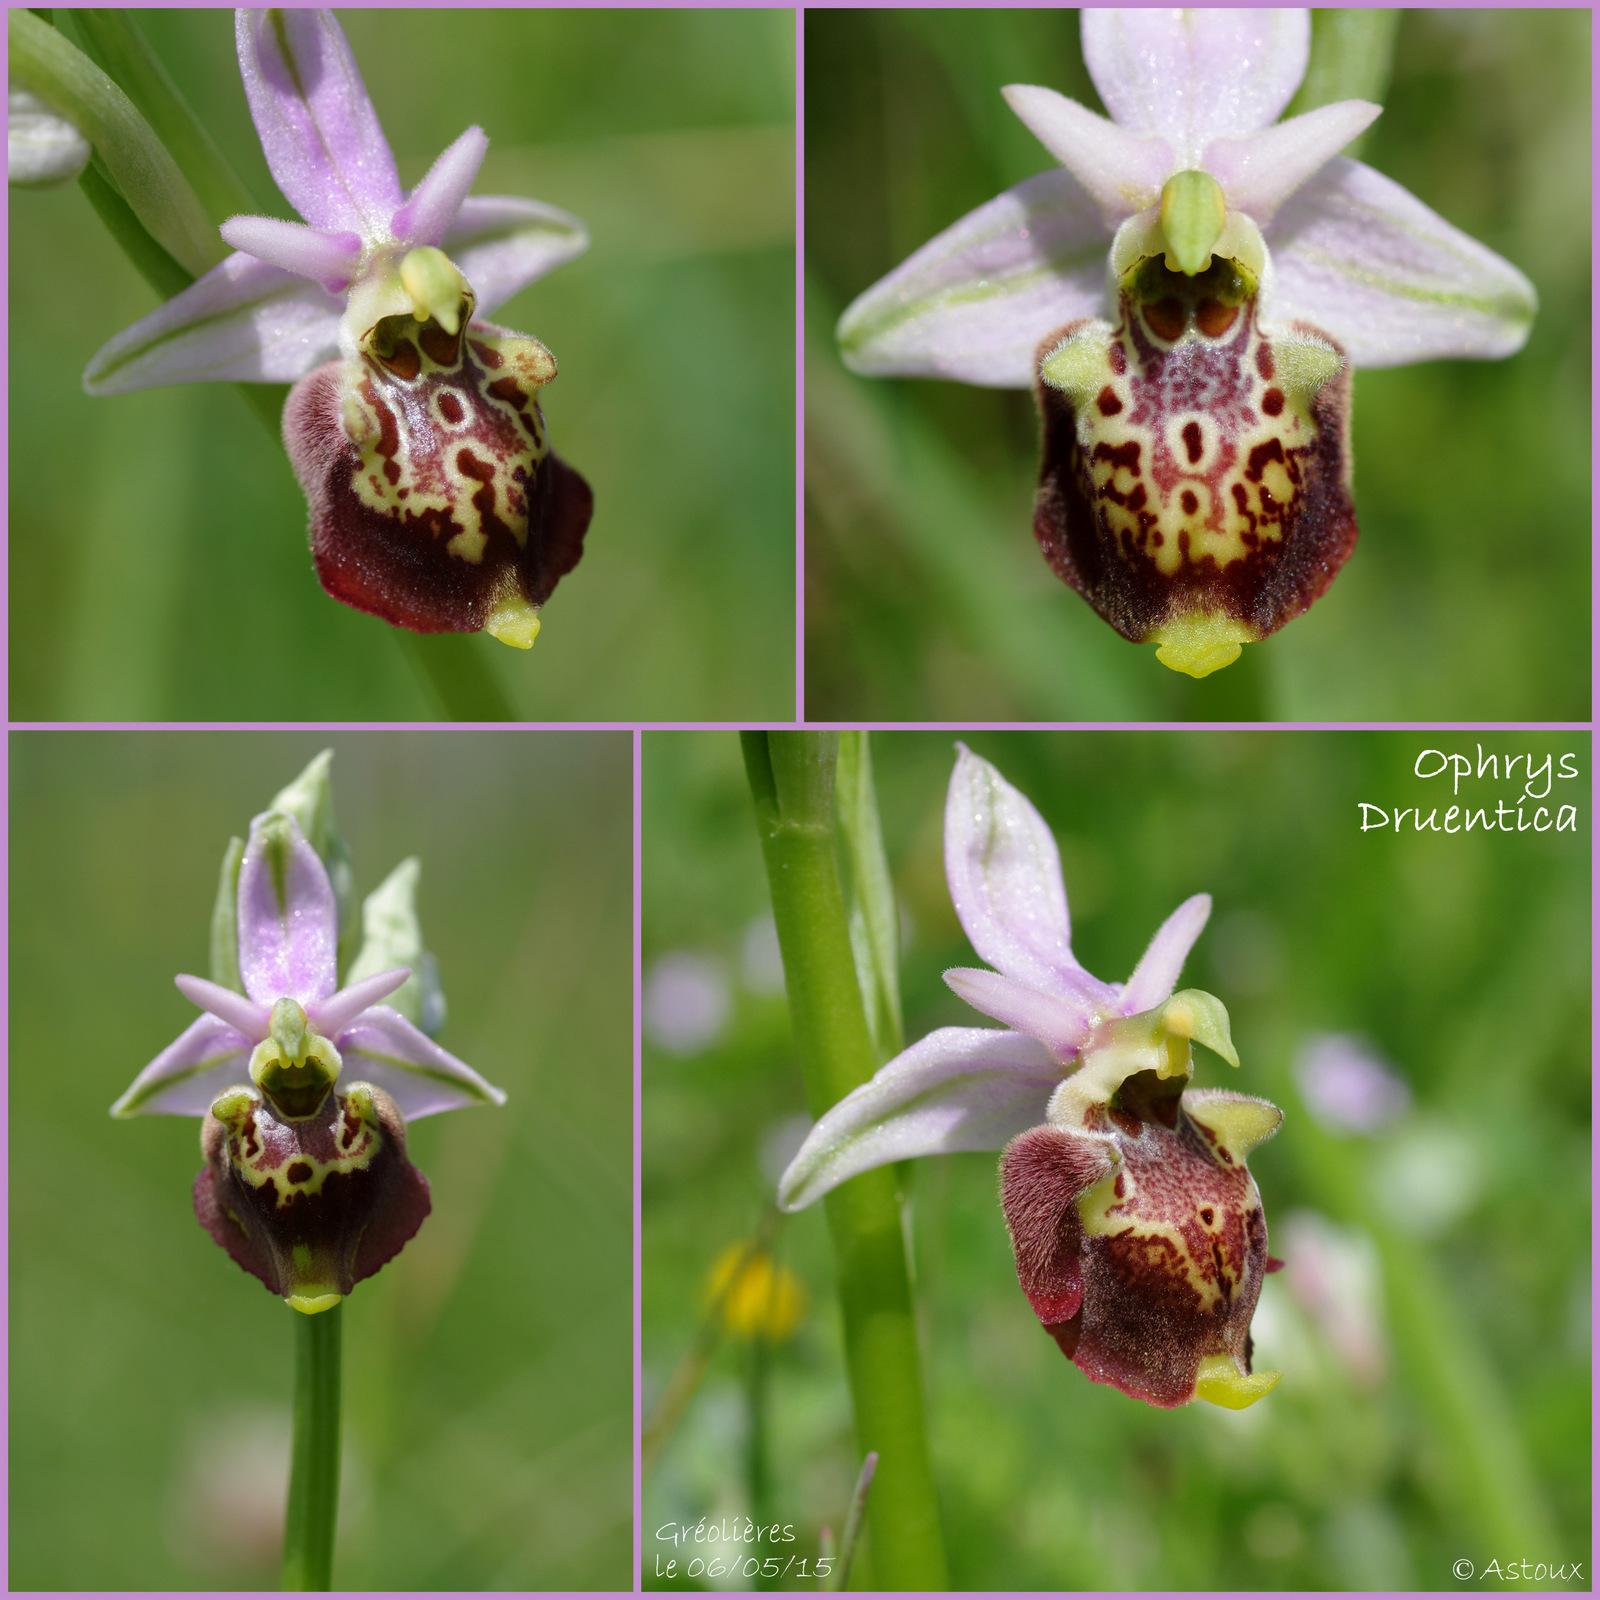 Ophrys druentica (Ophrys de la Durance) 914091SortieOrchides0605151